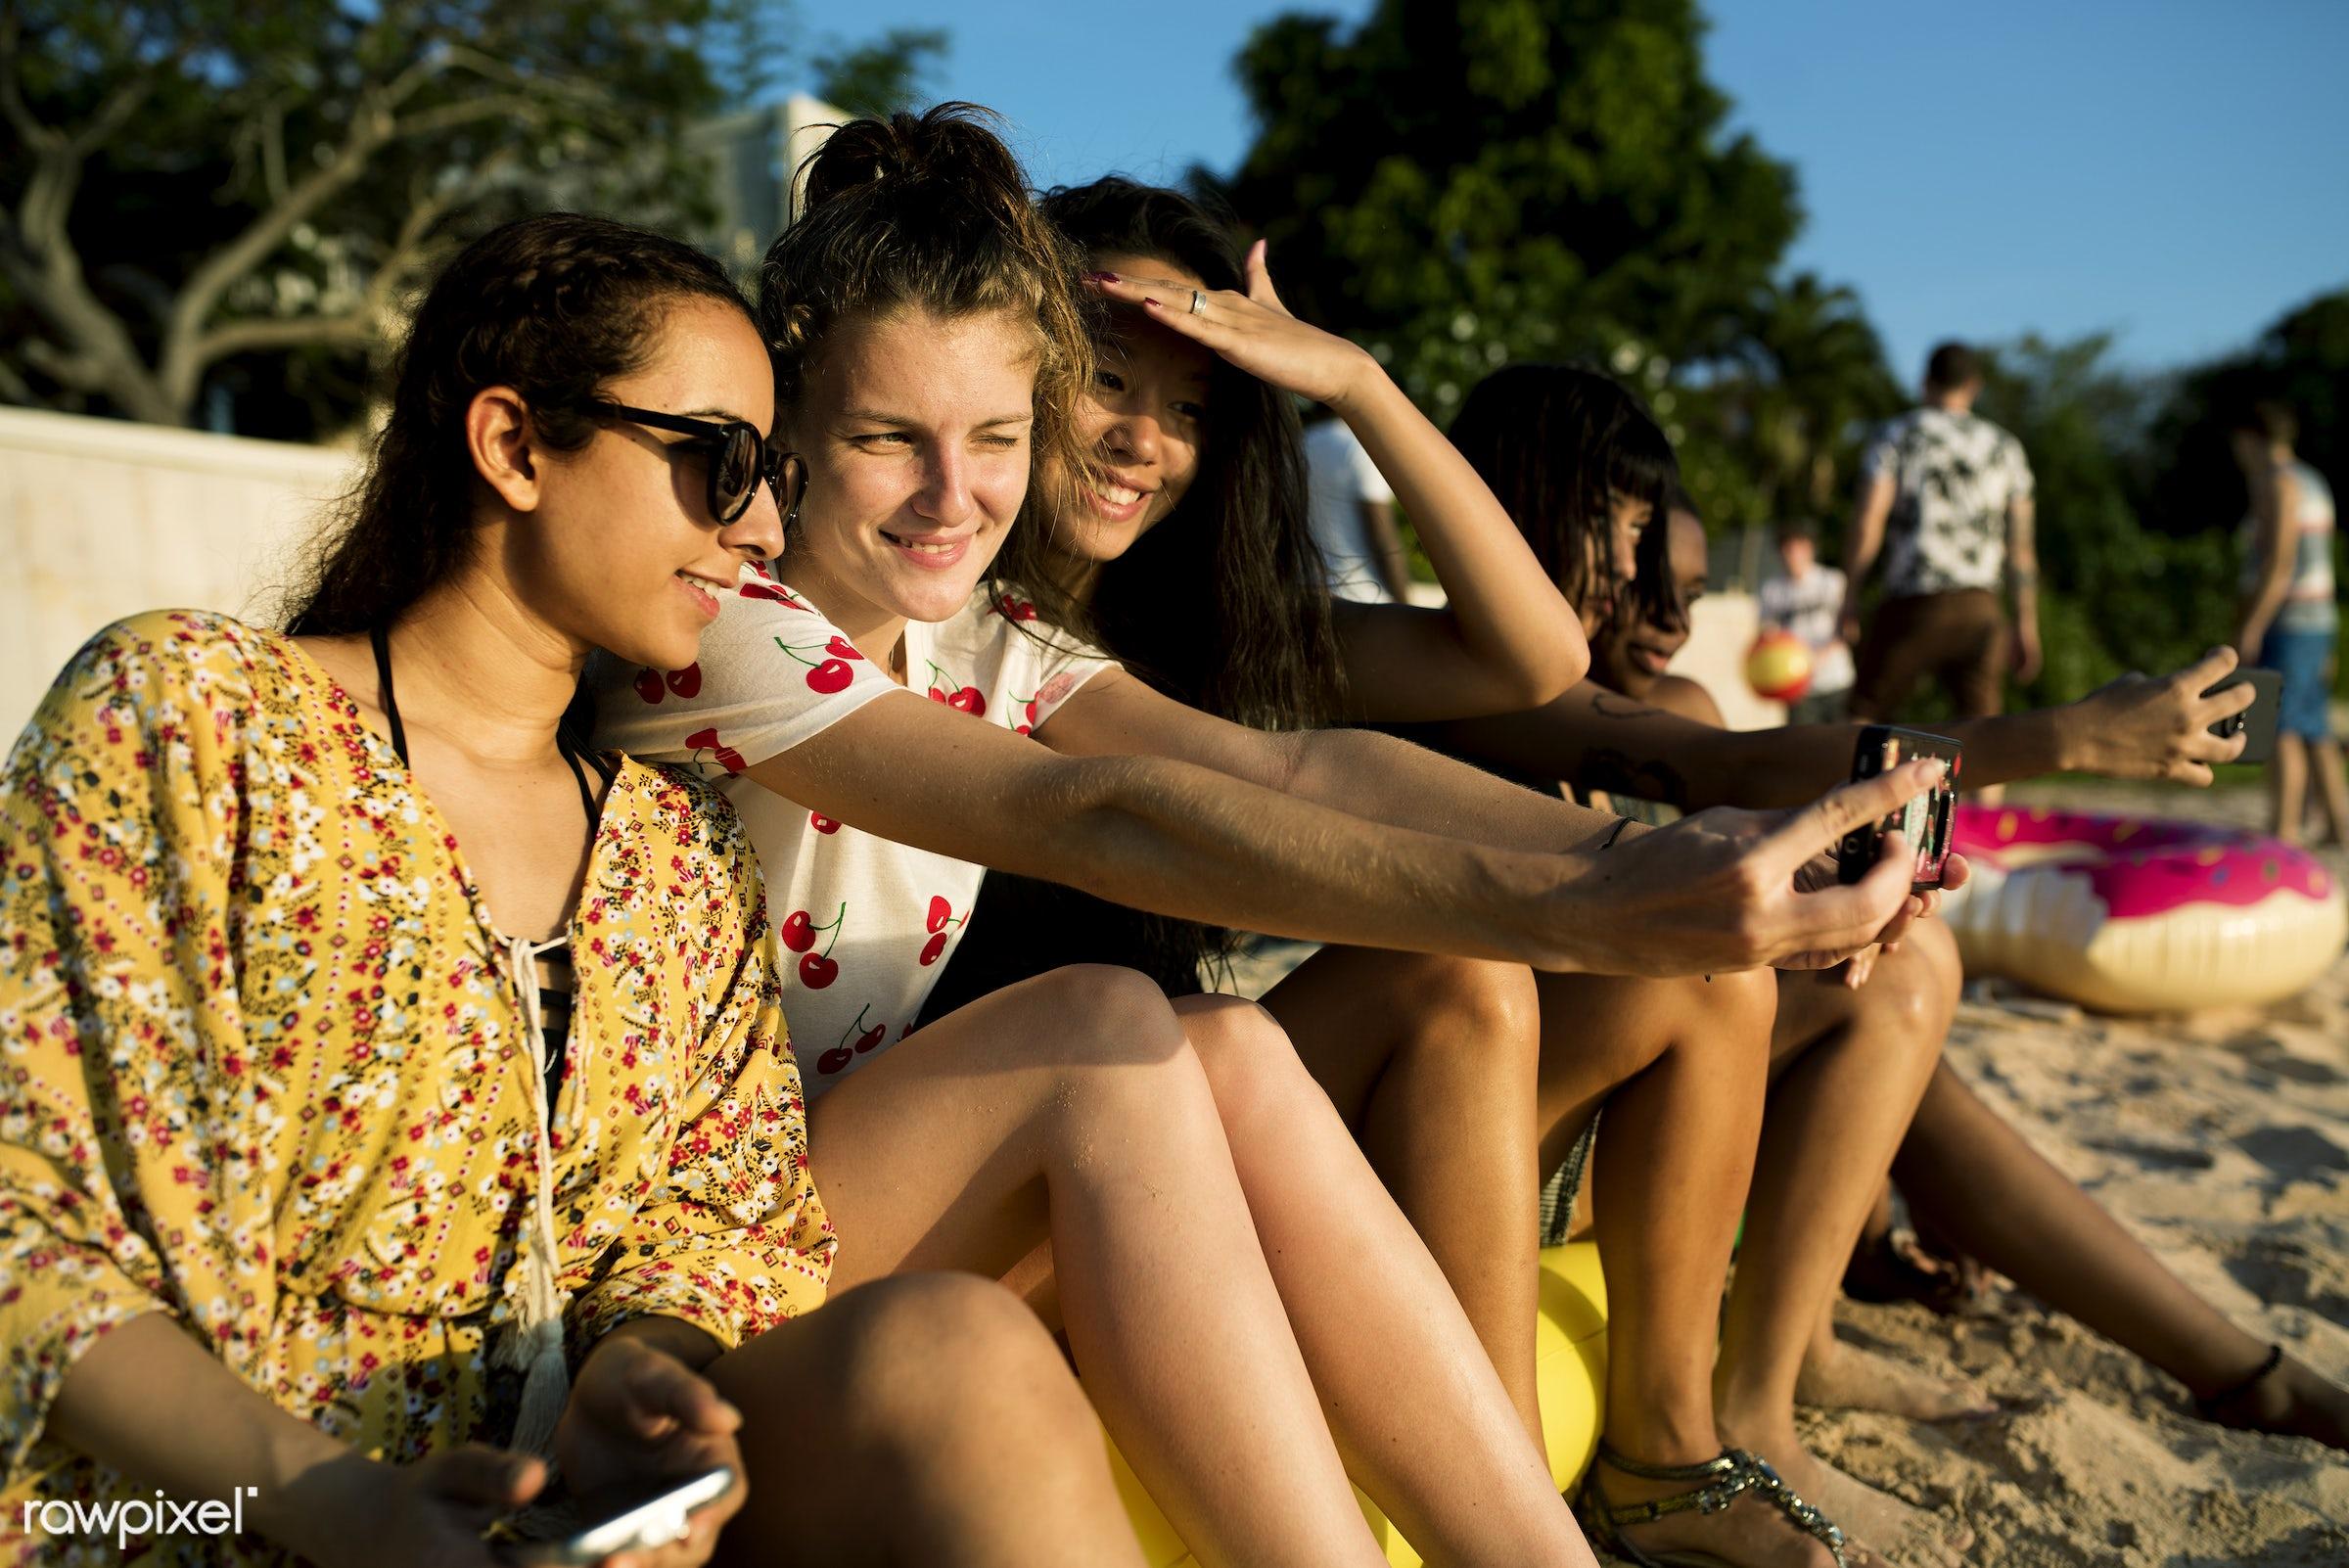 phone, relax, diverse, beach, people, together, coast, break, friends, tattoo, cheerful, activity, closeup, sand, sea, fun,...